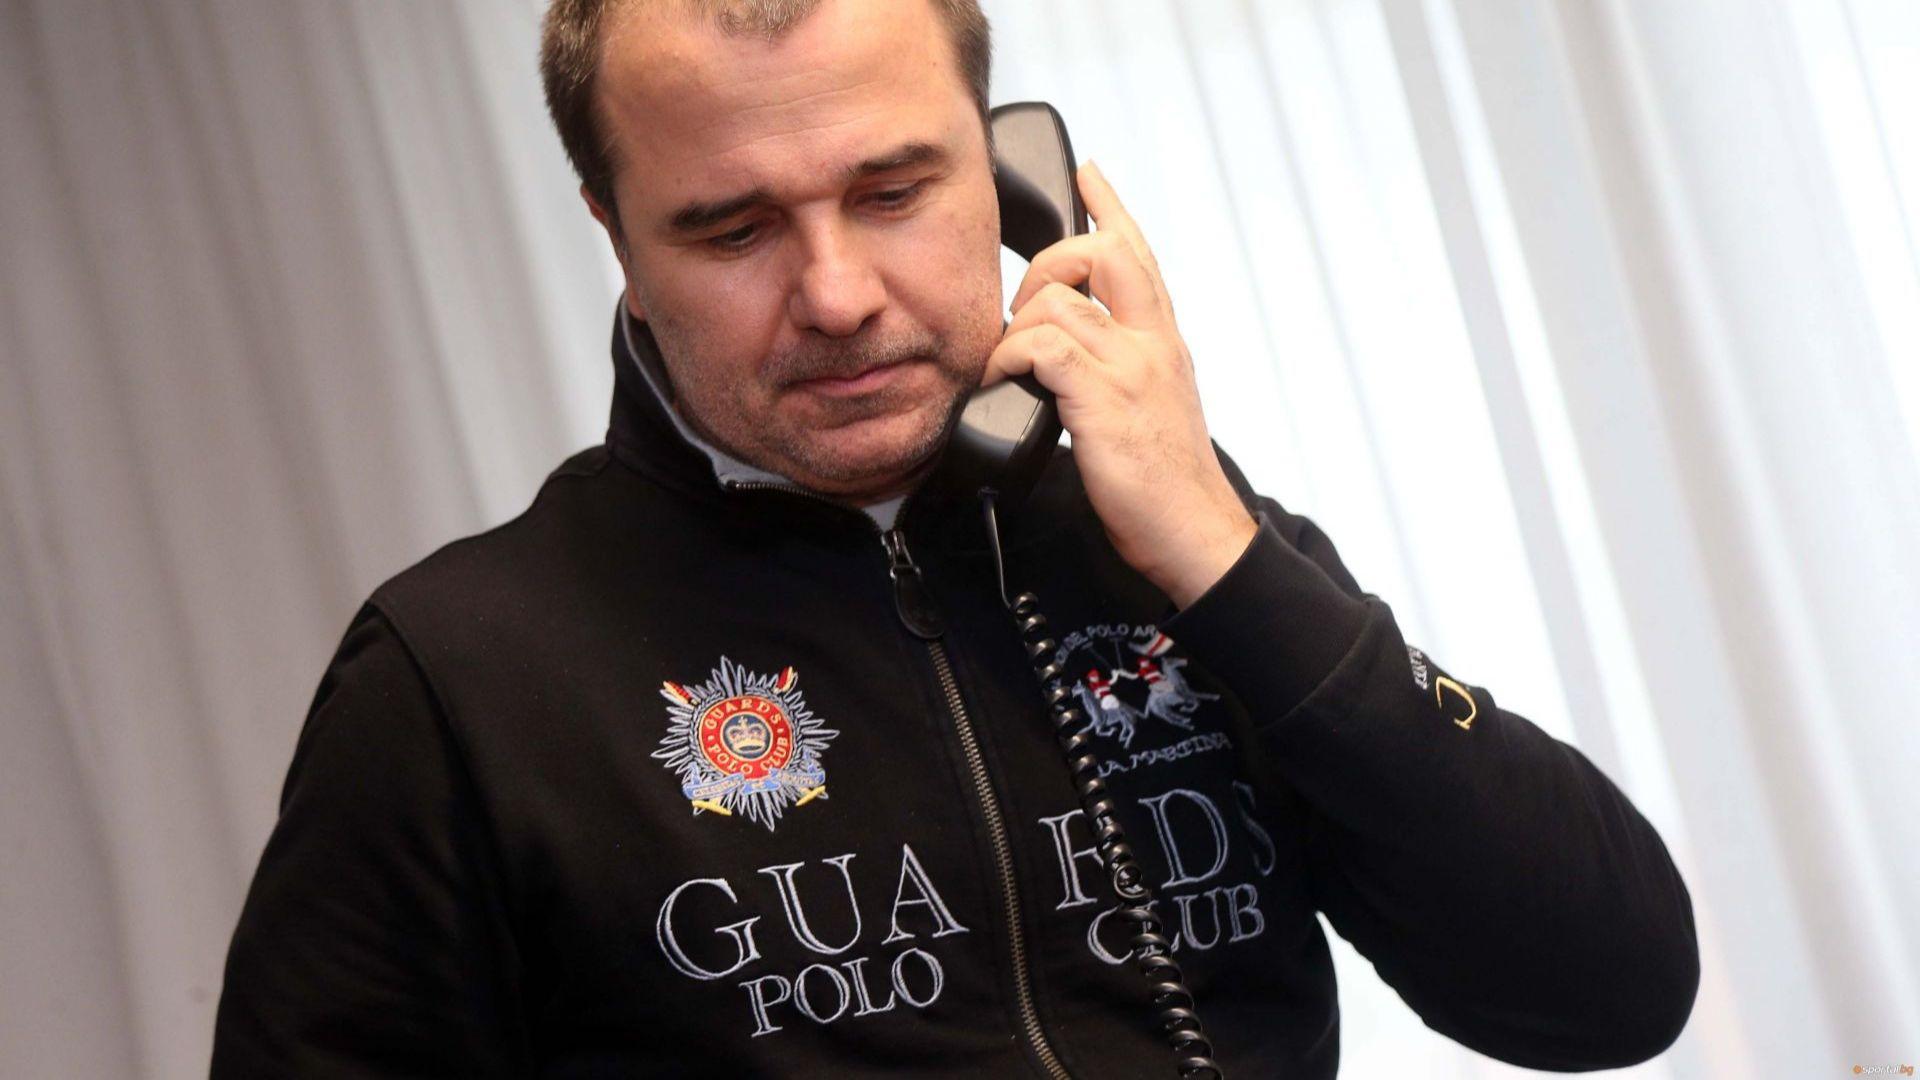 Цветомир Найденов: ЛиЛана беше любовница на Васил Божков около 10 г.